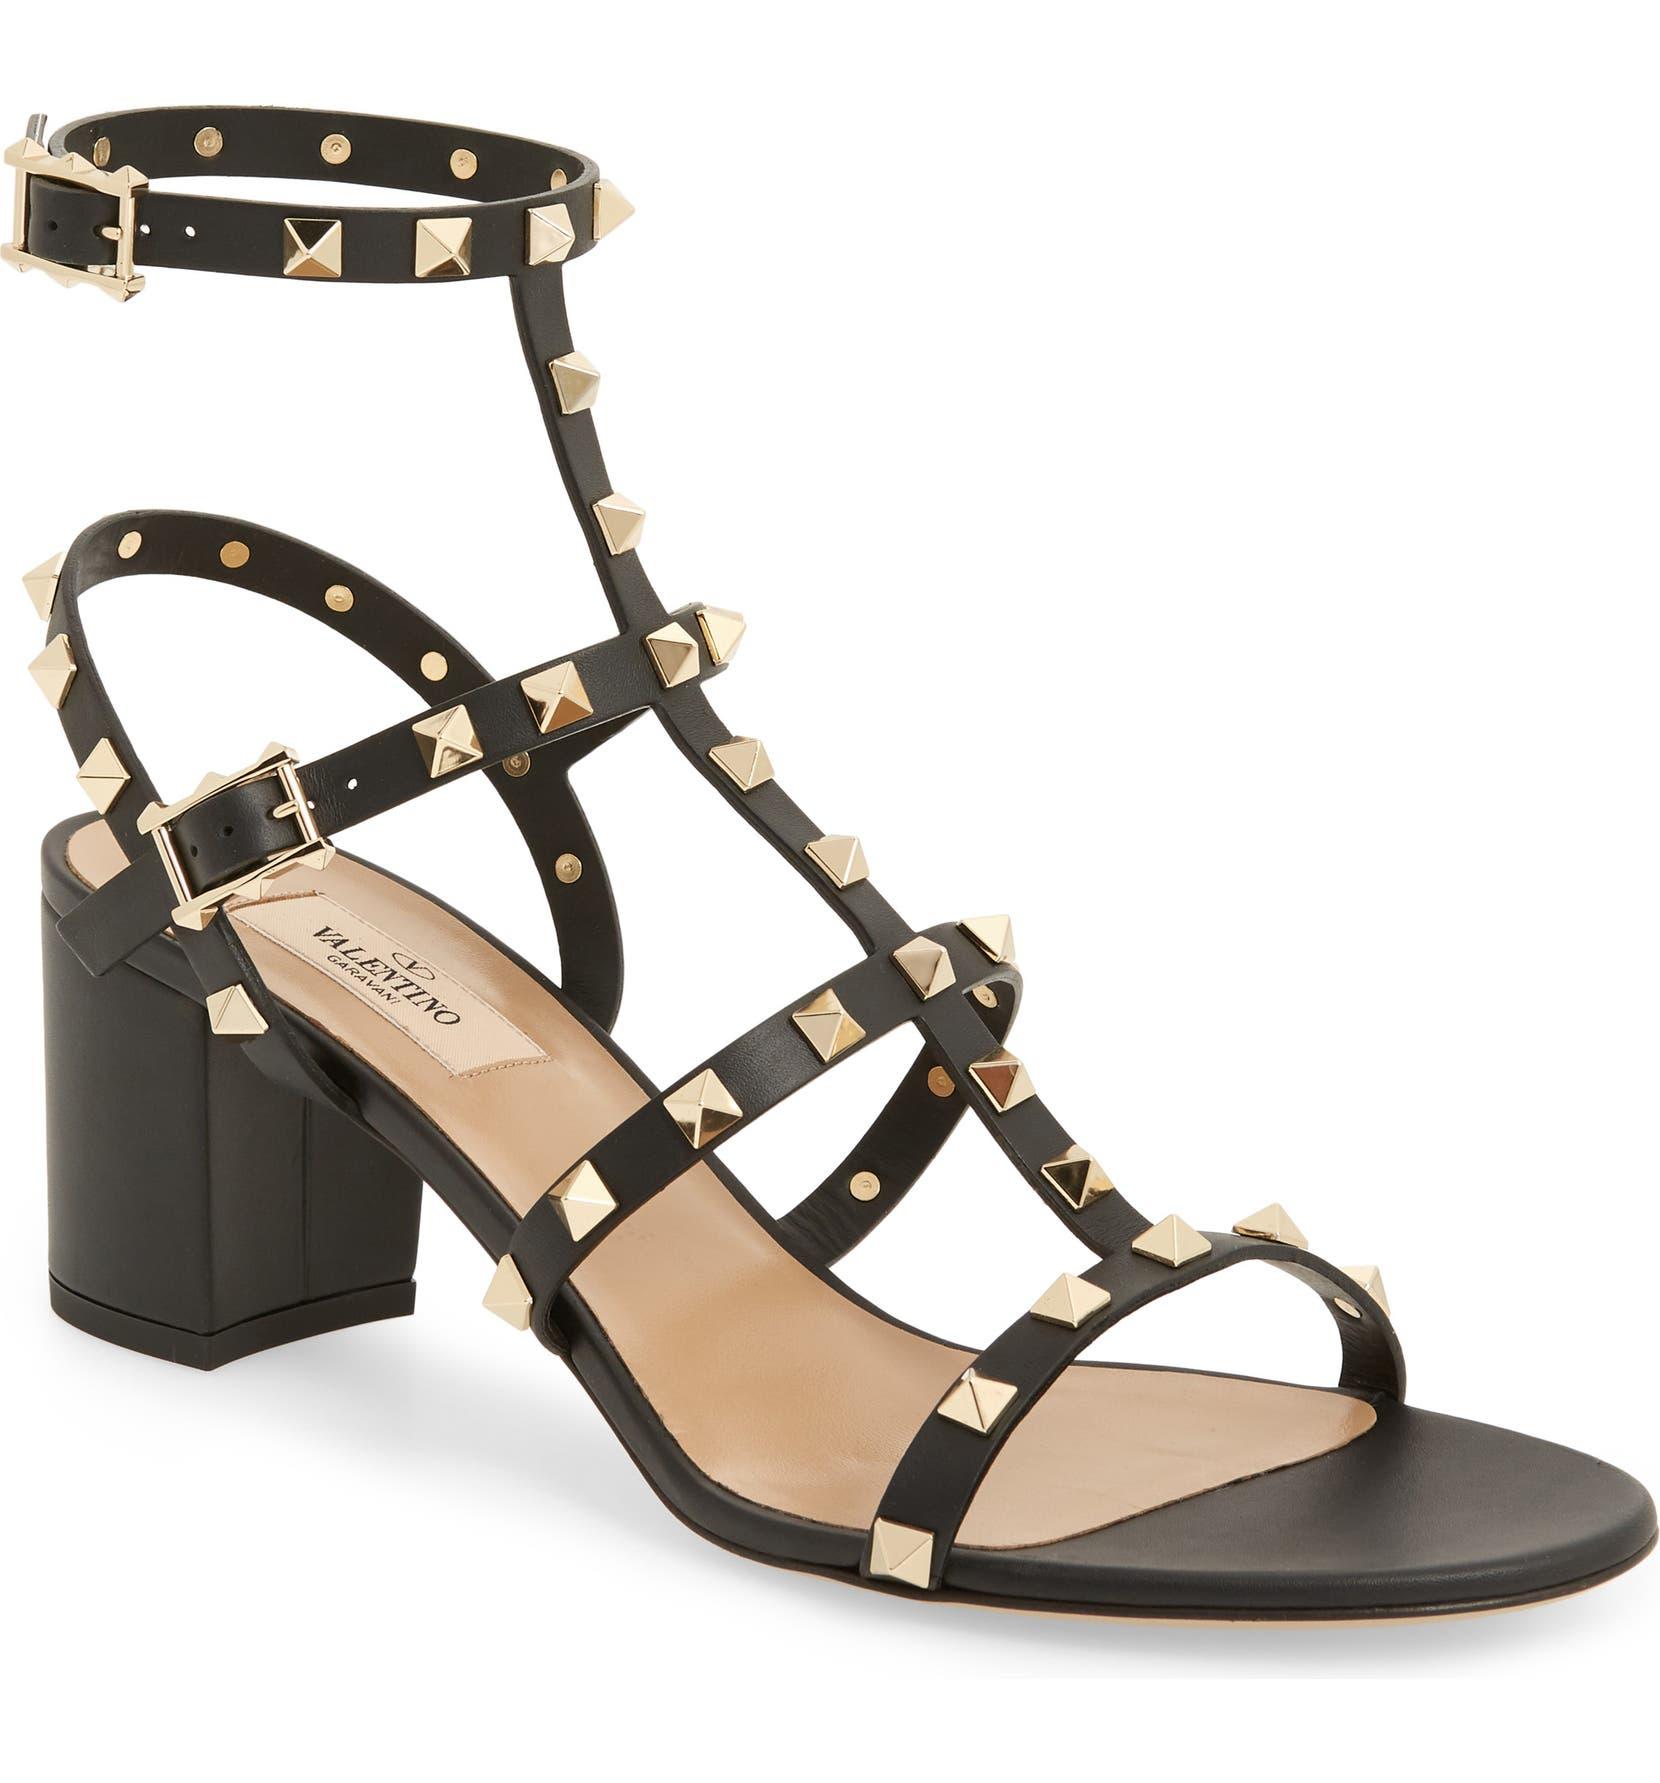 4910c5075d1 VALENTINO GARAVANI Rockstud Block Heel Sandal (Women)